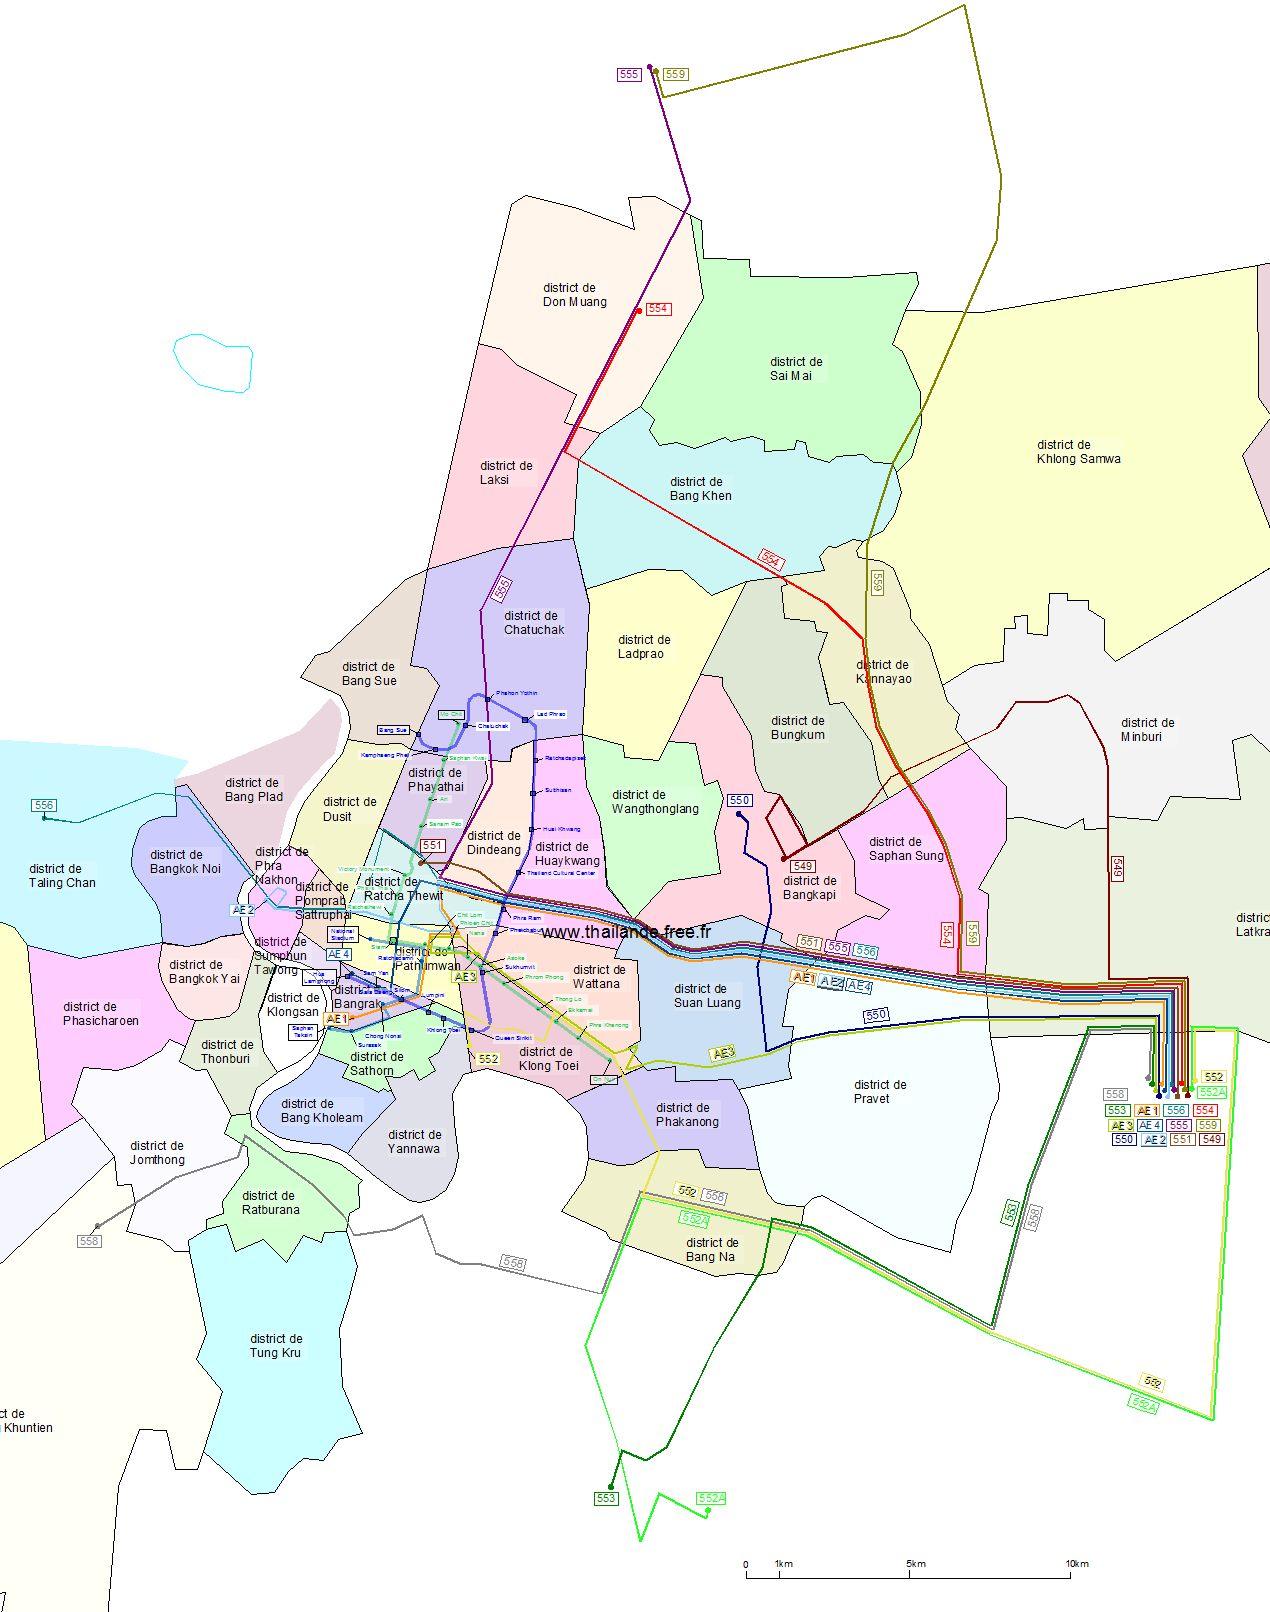 Carte Thailande Imprimer.Cartes De Thailande Villes Et Regions Cartes Routieres